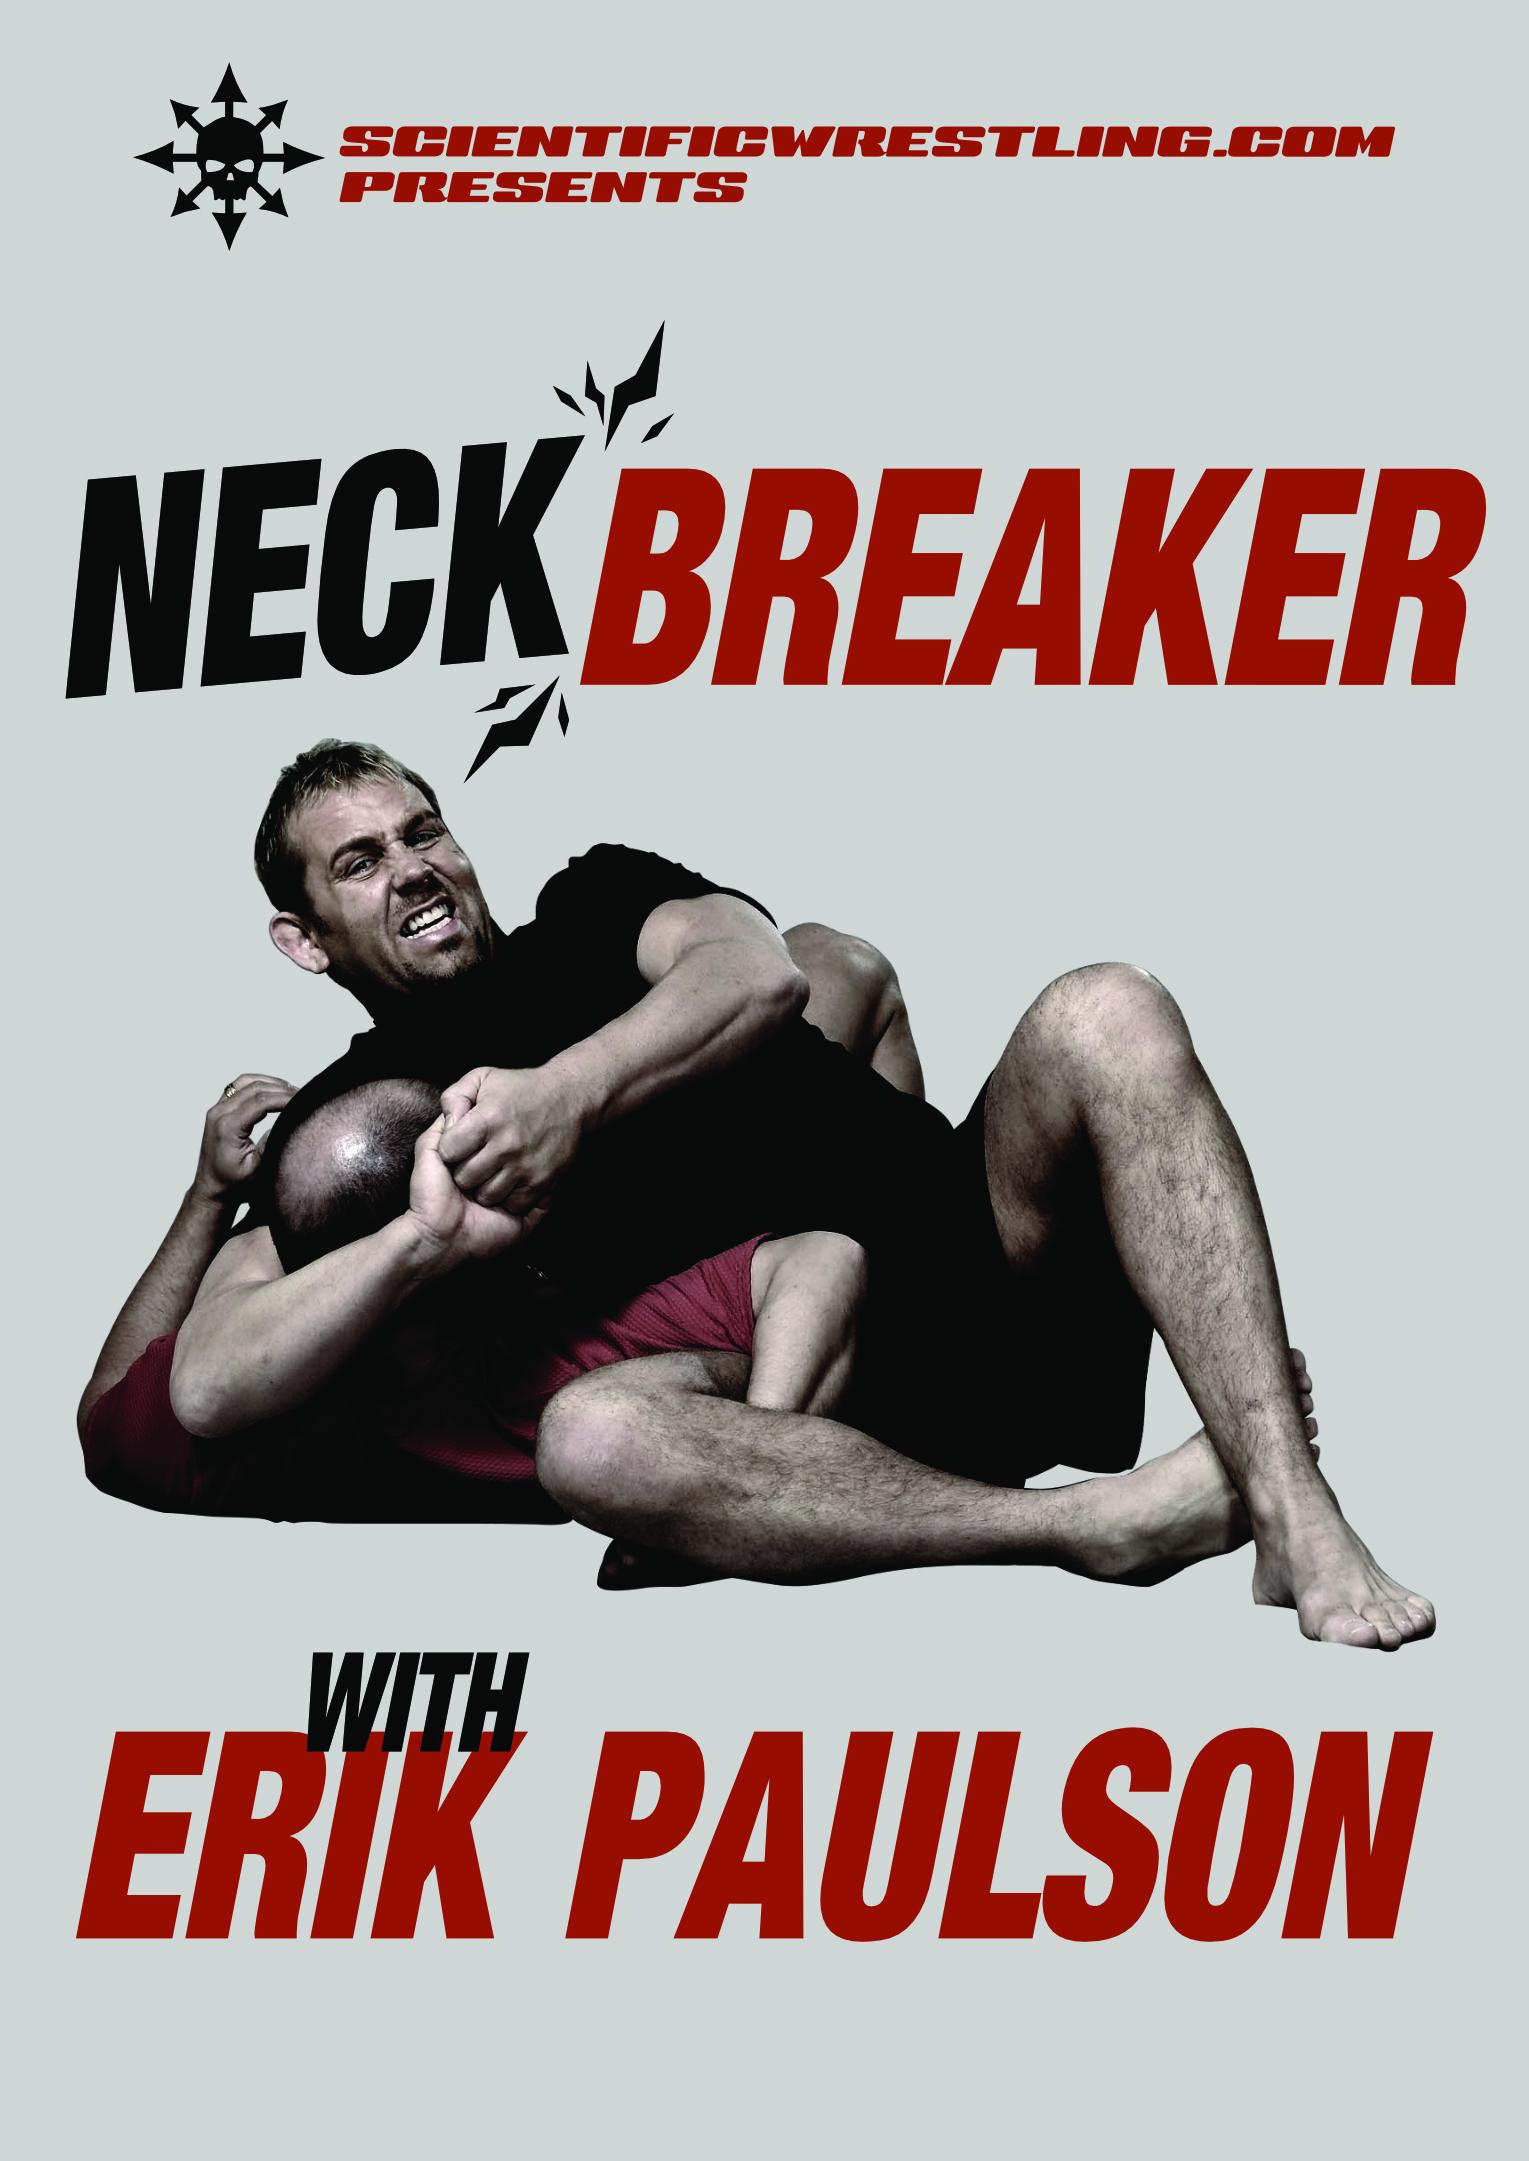 Erik Paulsons NECKBREAKER Deluxe 2-DVD Set